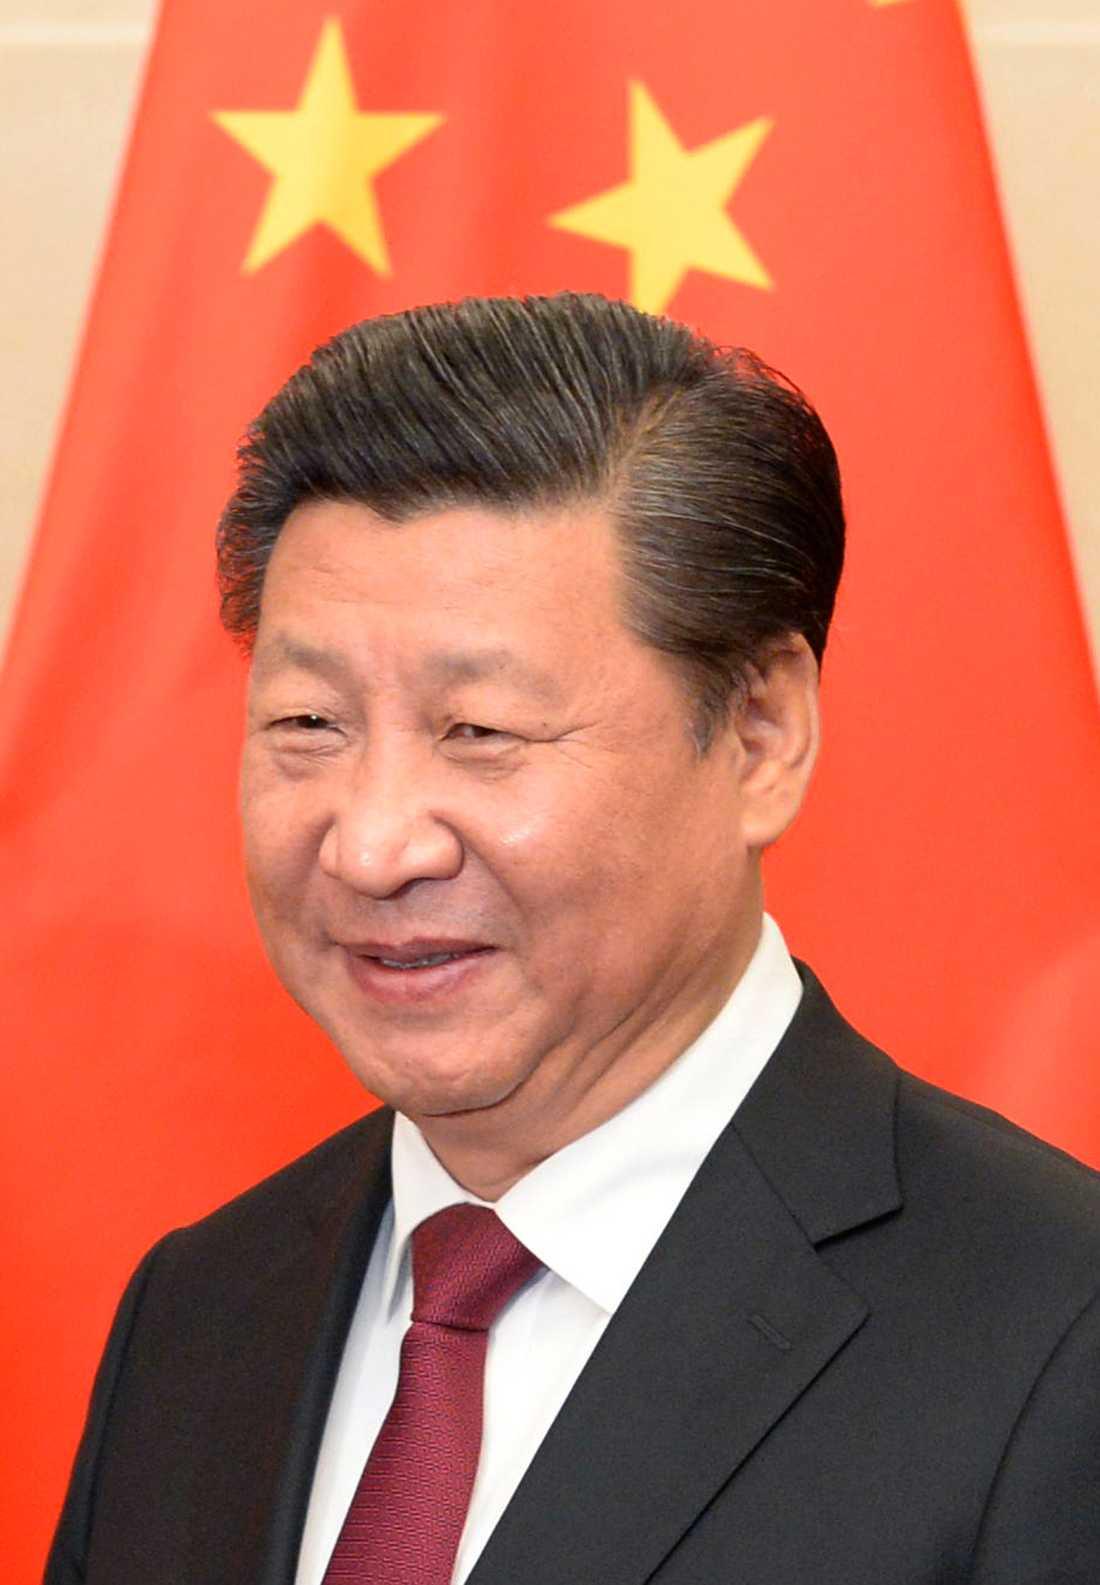 Kinas president Xi Jinping.